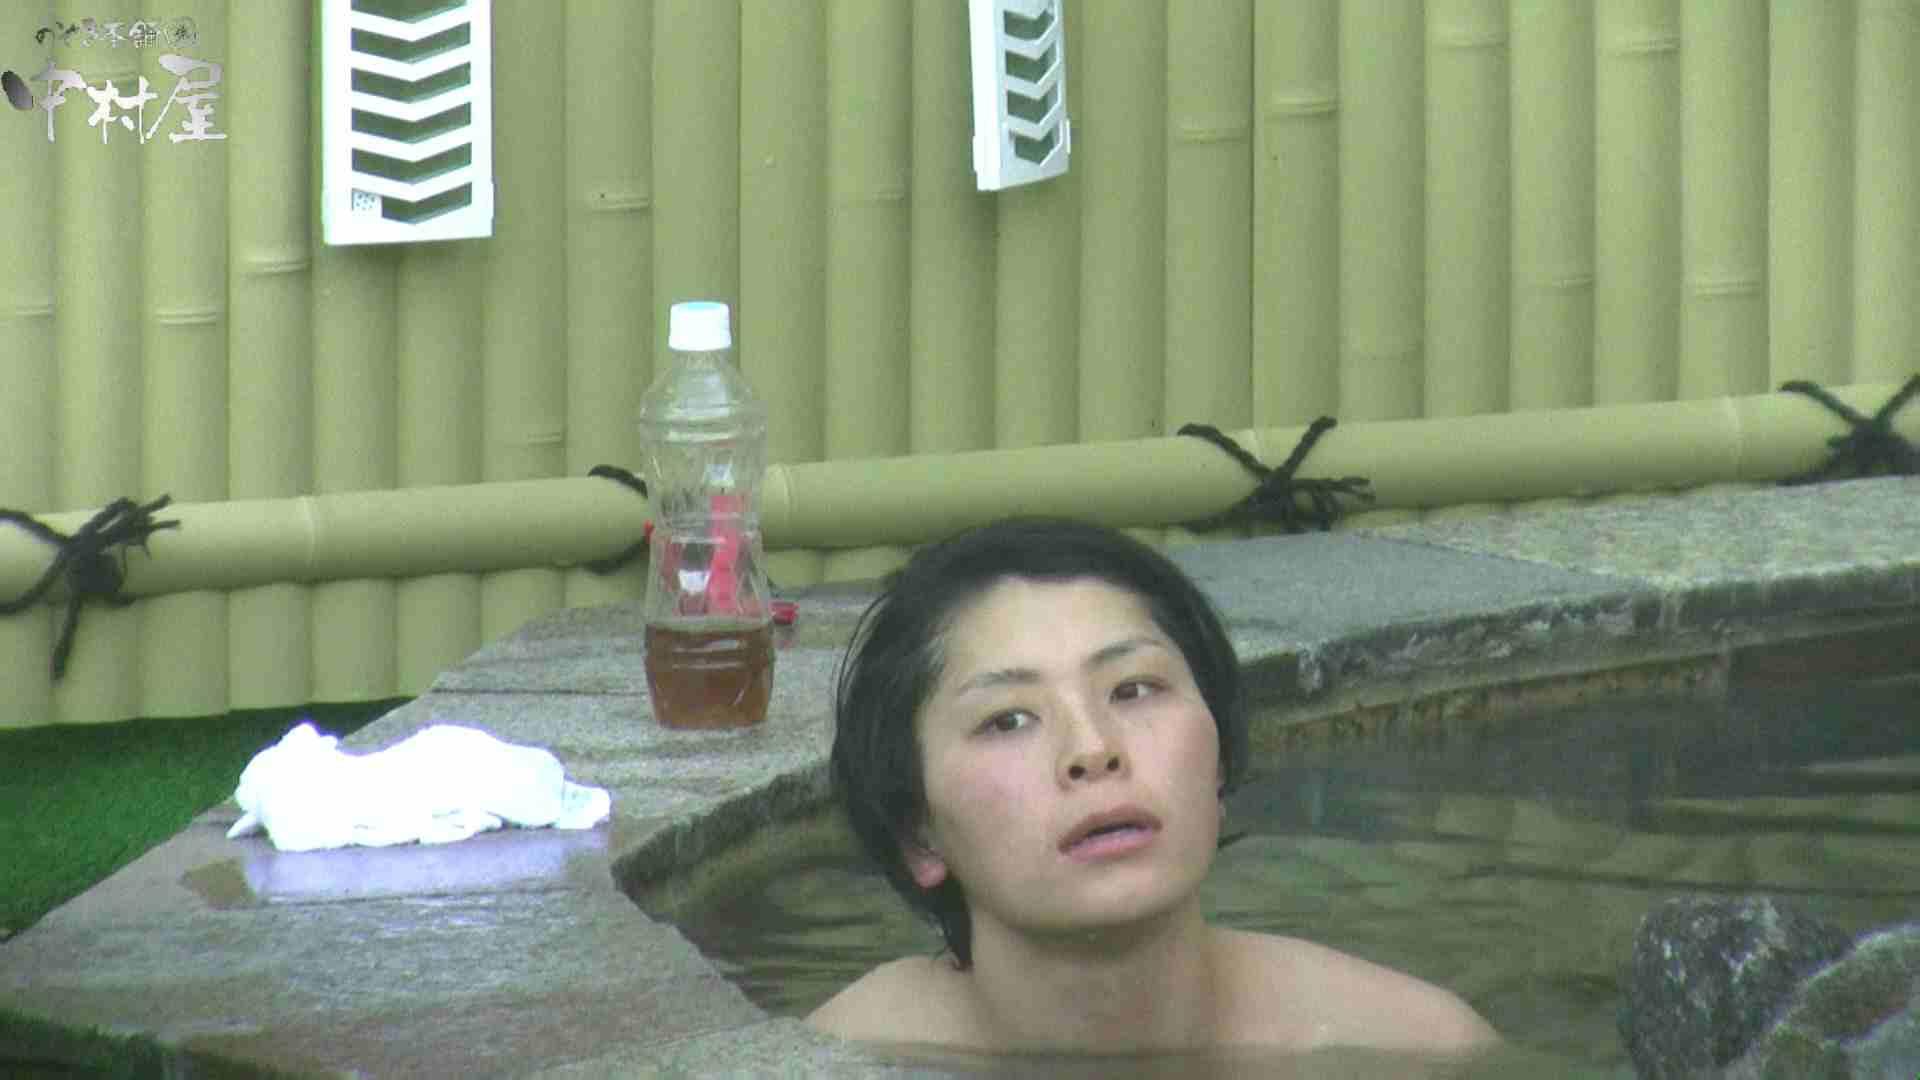 Aquaな露天風呂Vol.970 露天 | OLセックス  97画像 28